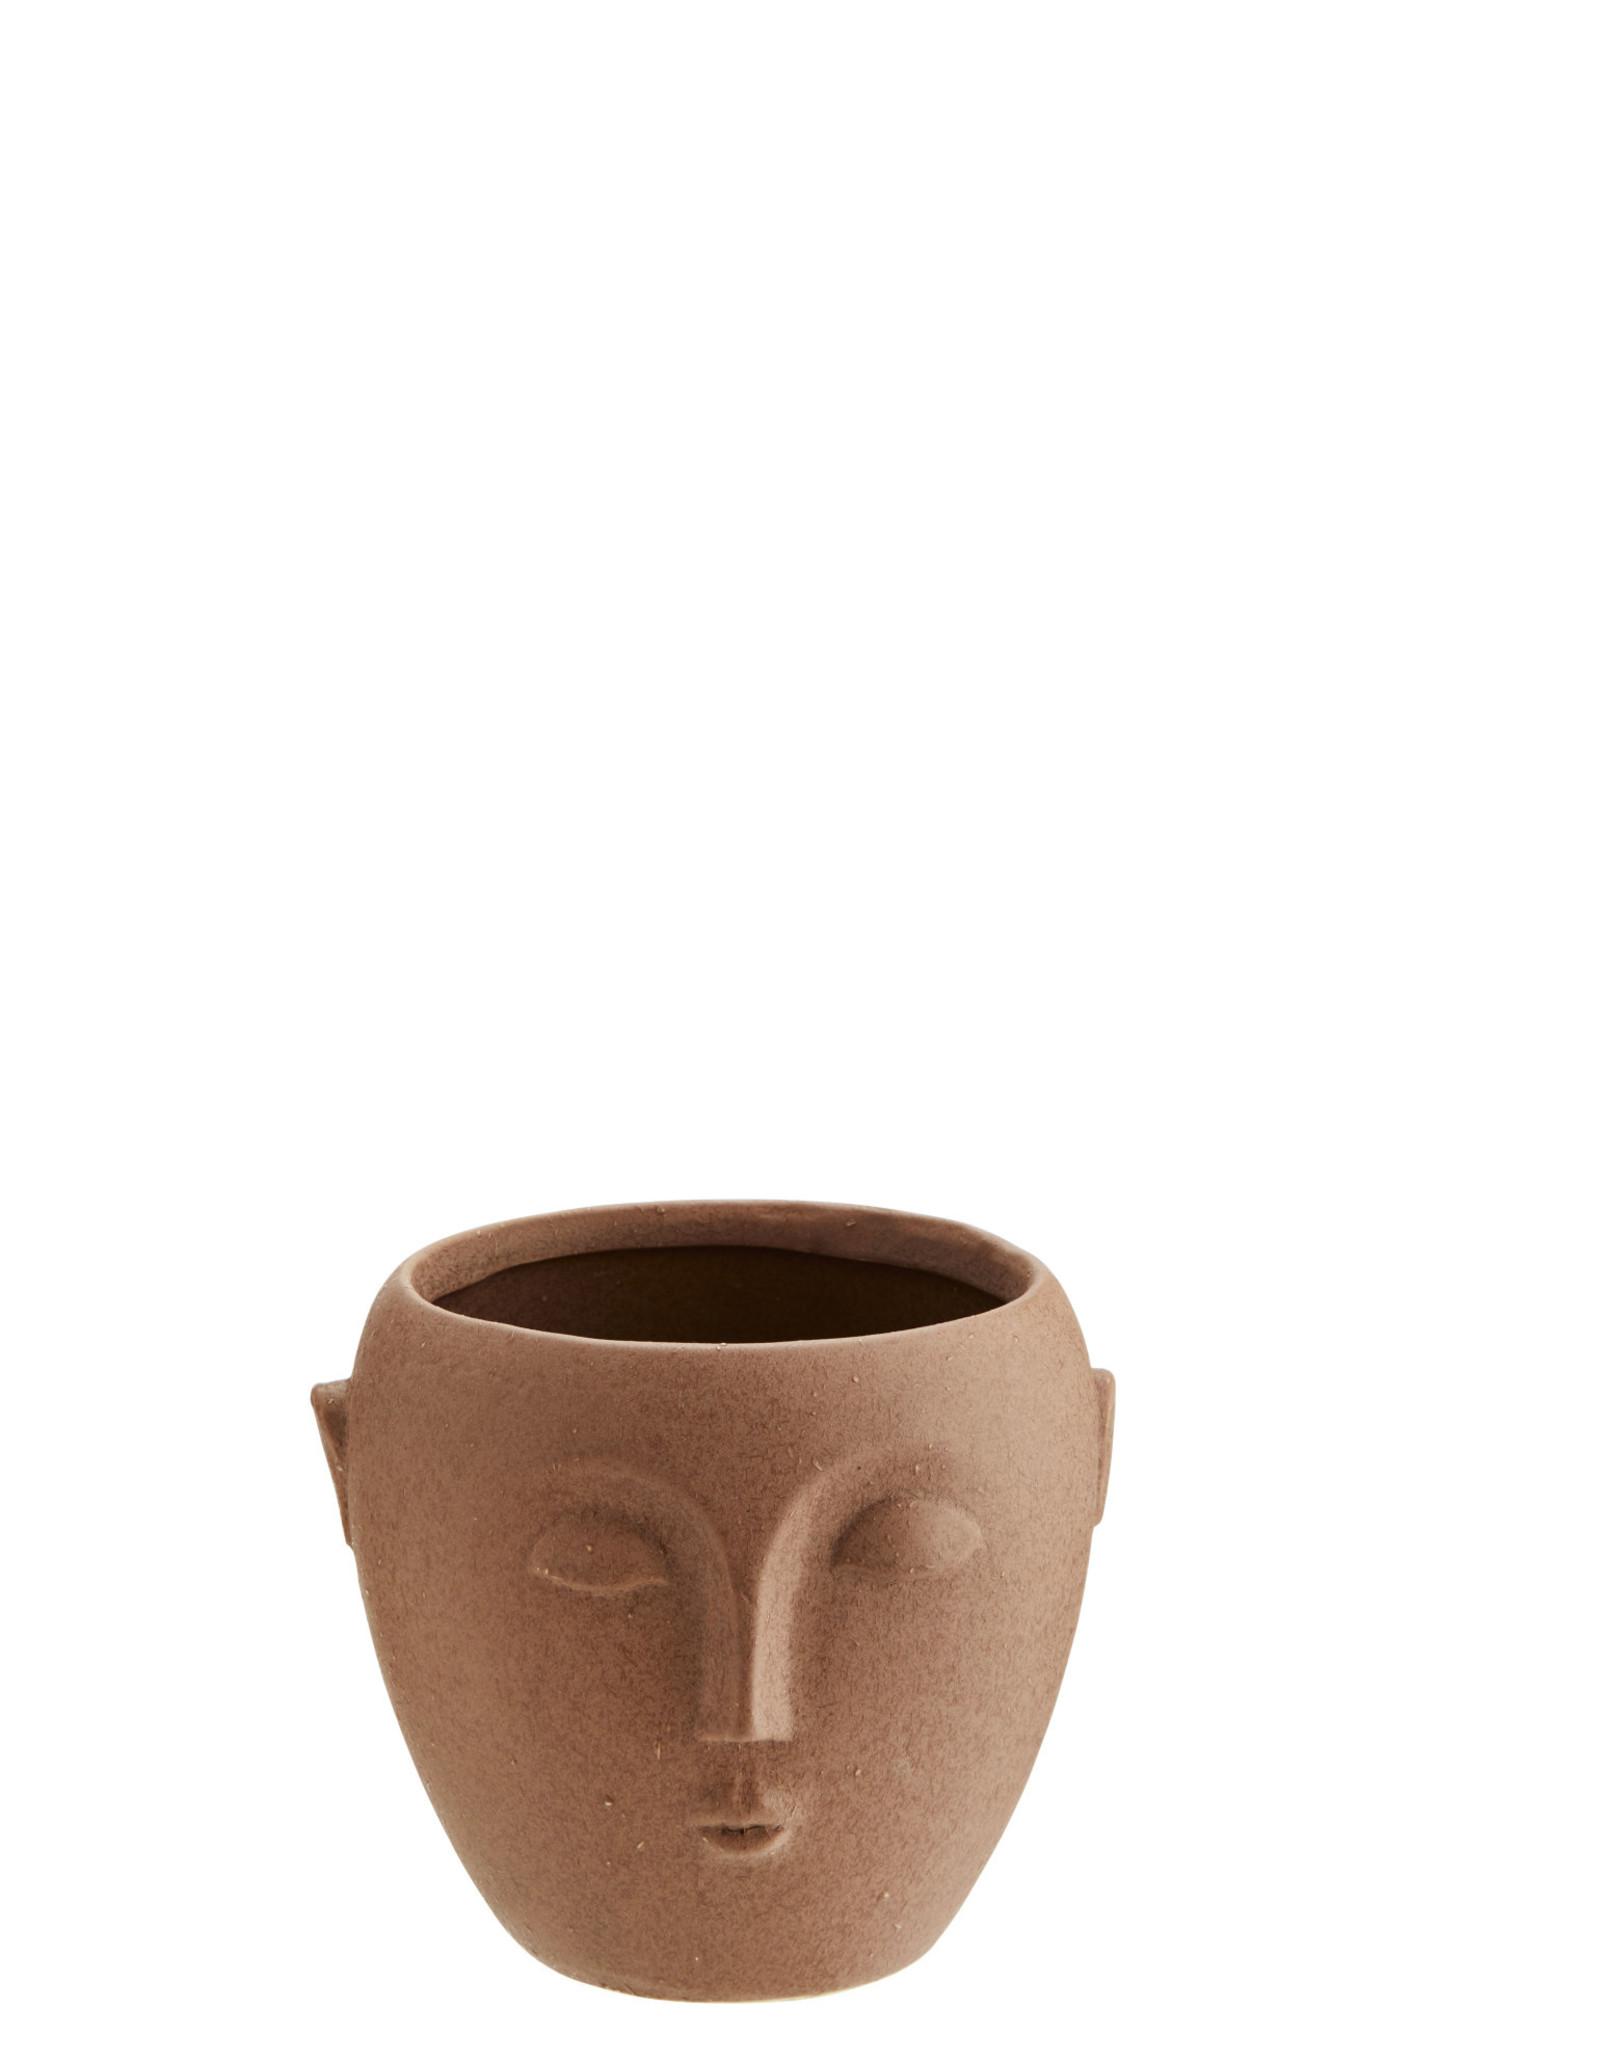 Madam Stoltz Flower pot w/ face - Red/Brown ∅8,5 cm